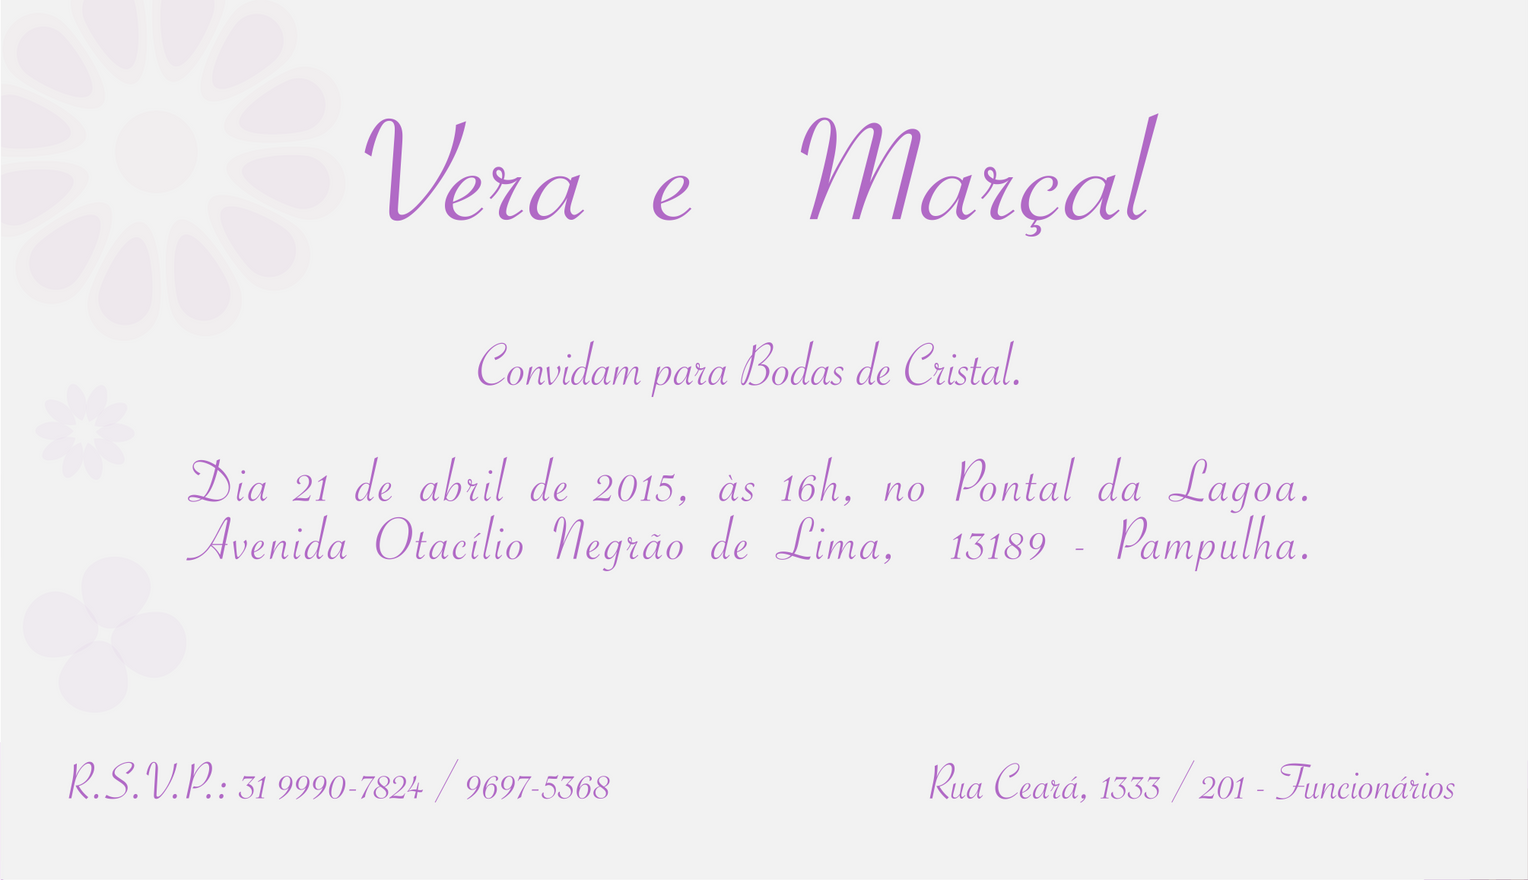 Convite do evento